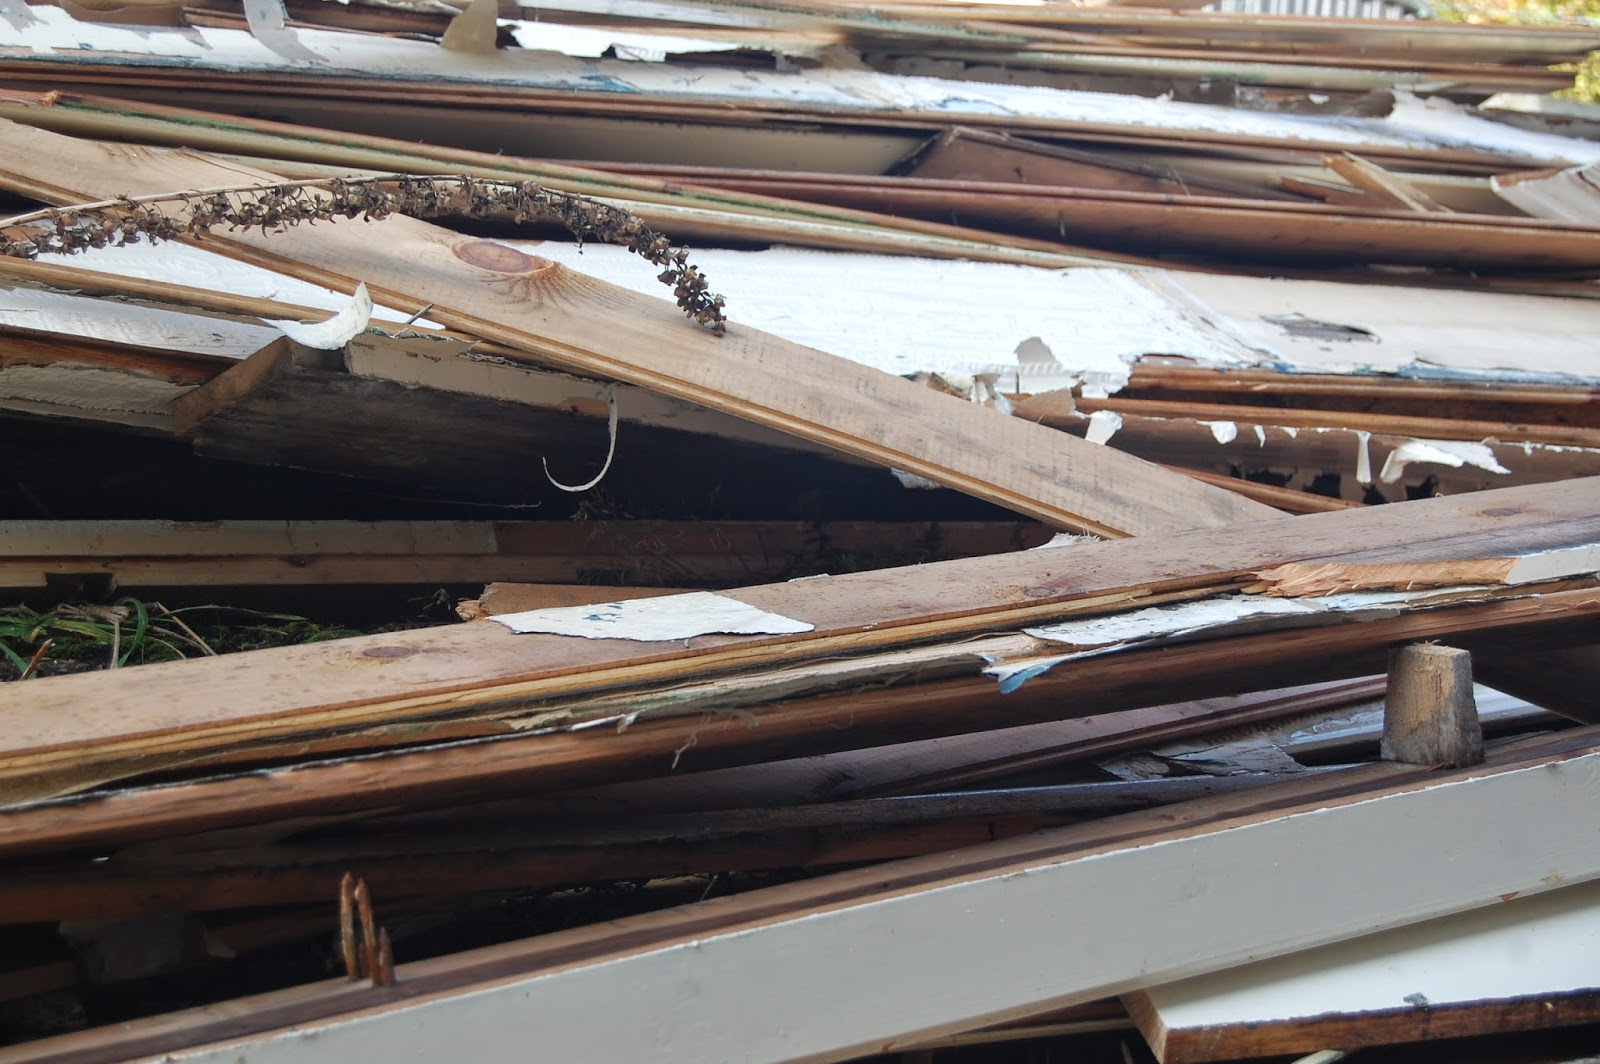 How old wood has a life after #lifeonpigrow